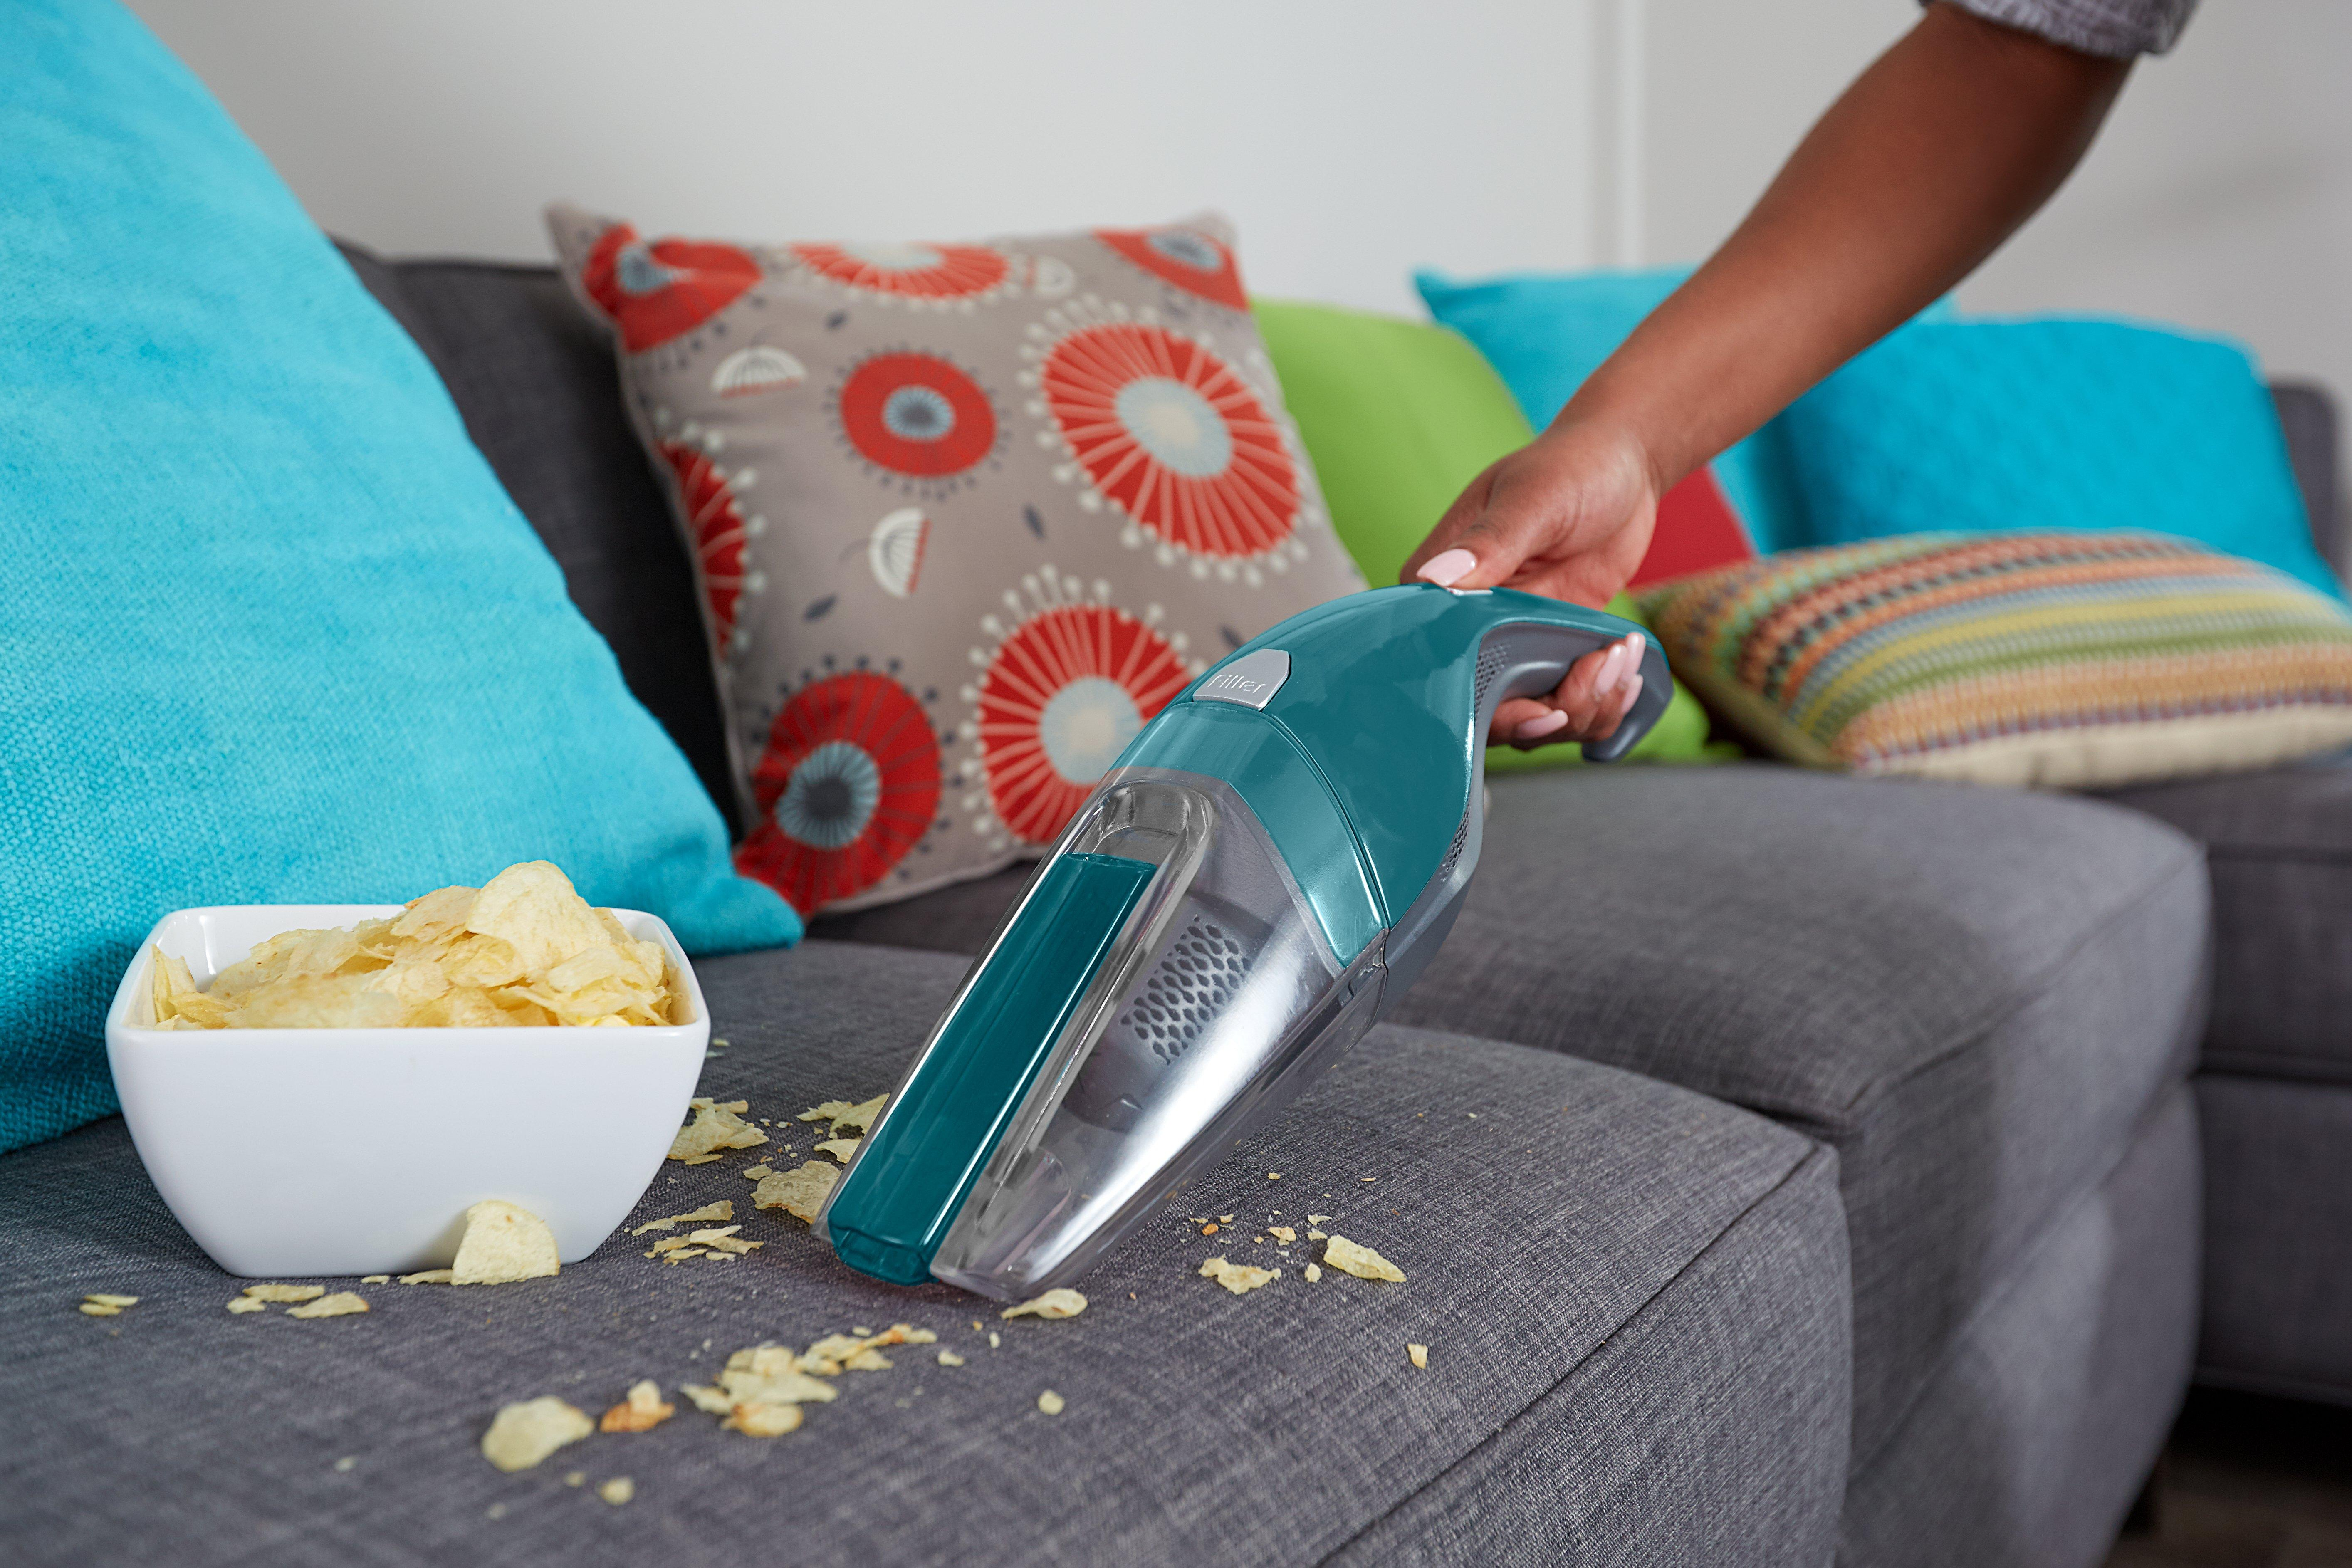 Quick Flip 8V Cordless Hand Vacuum7